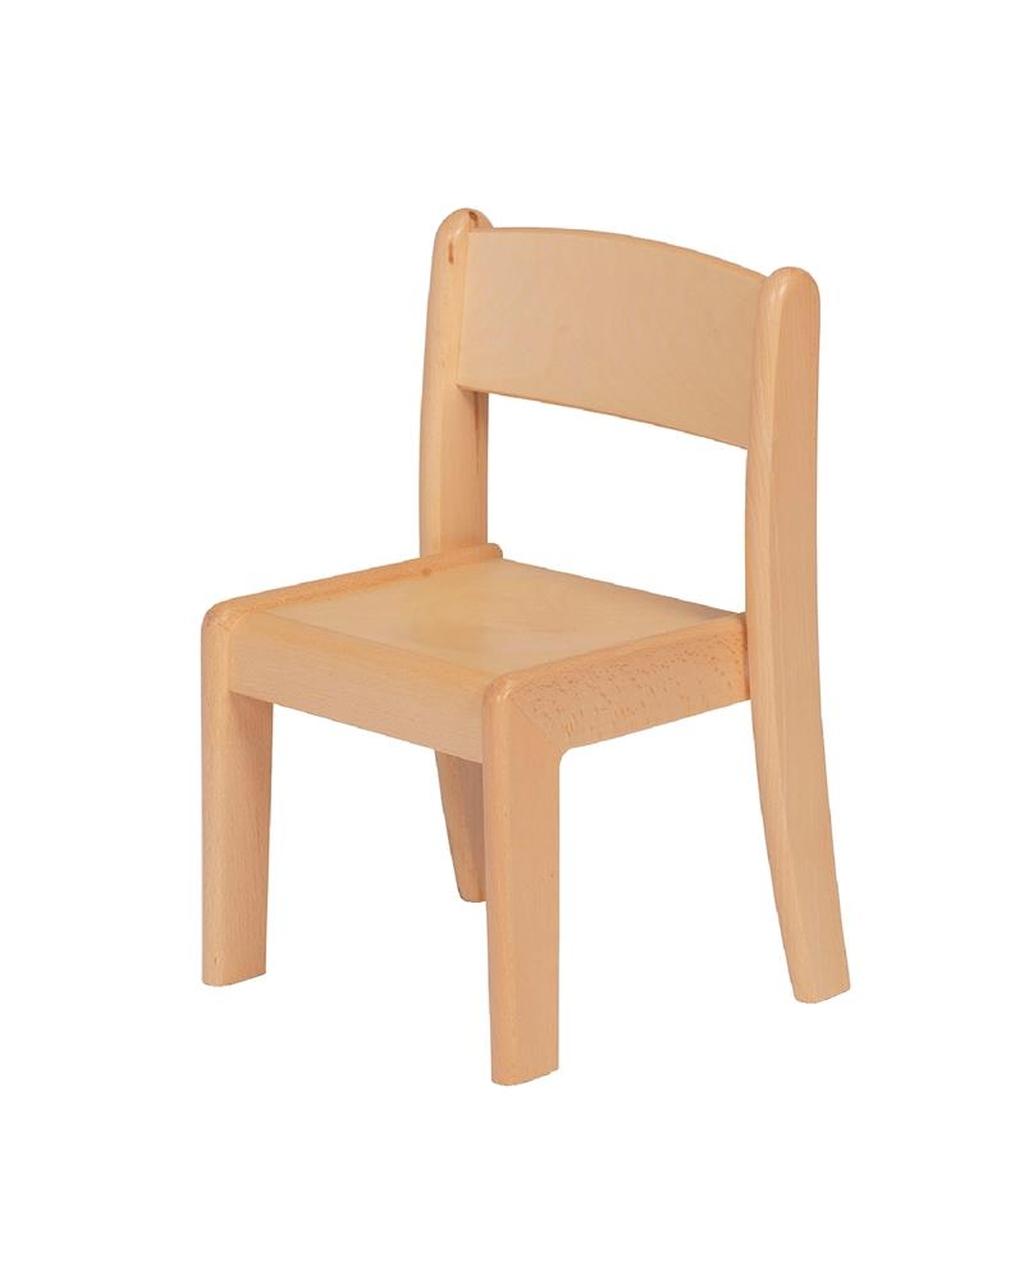 Beech Stacking Chair 310MM